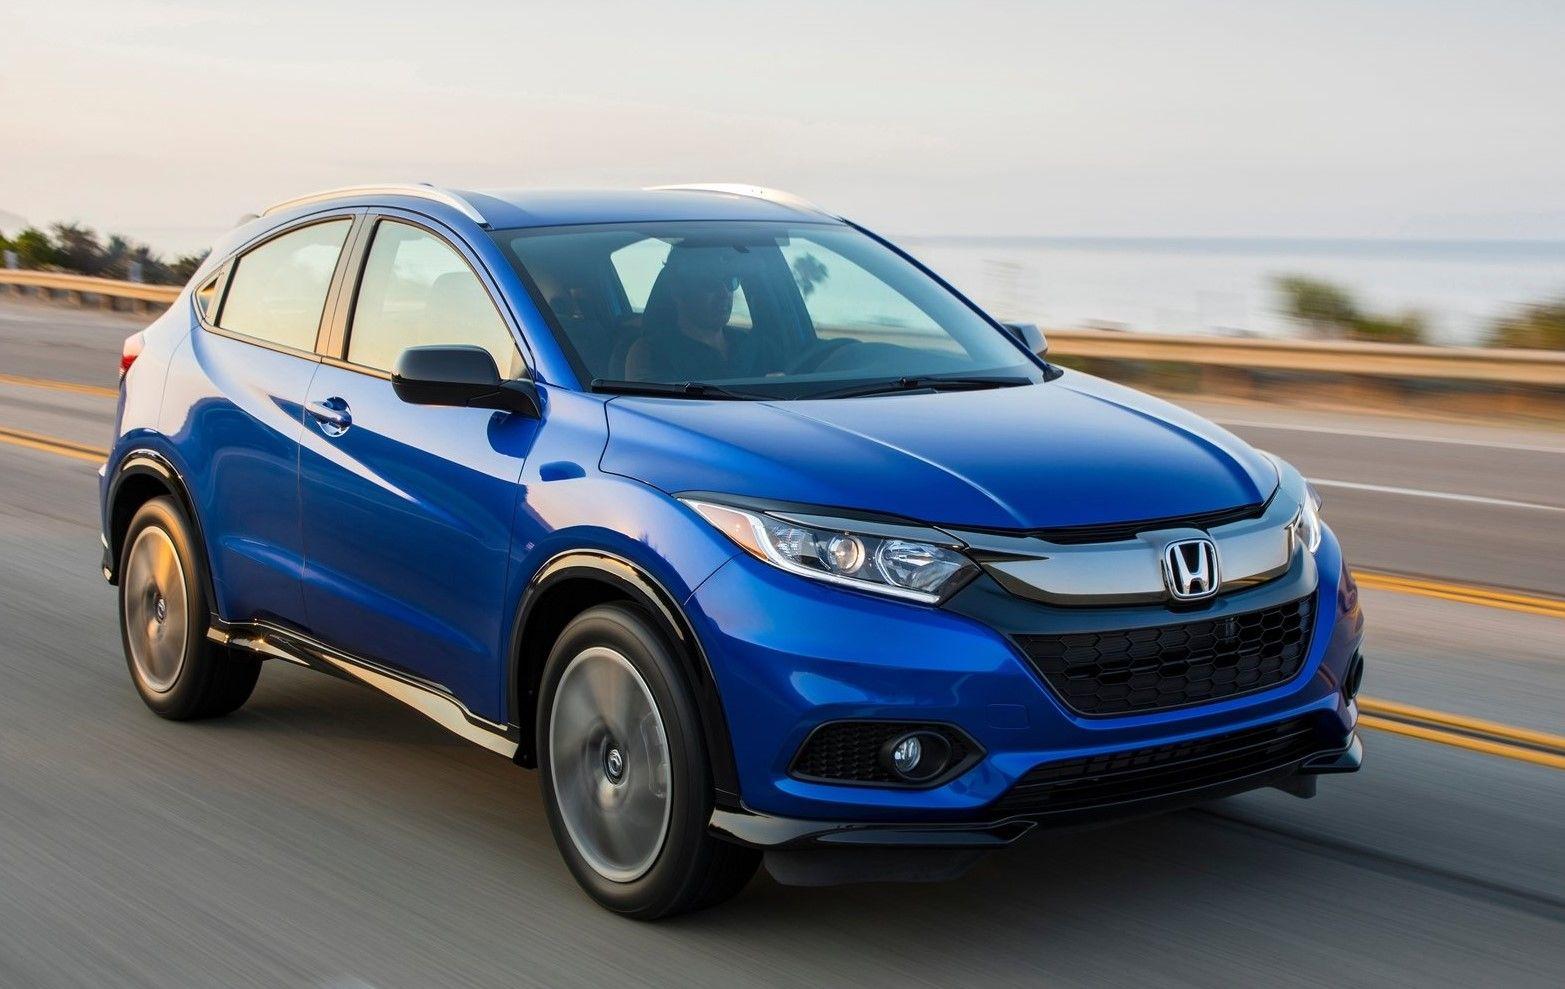 The 2019 Honda HR-V: A Multi-Dimensional Subcompact SUV